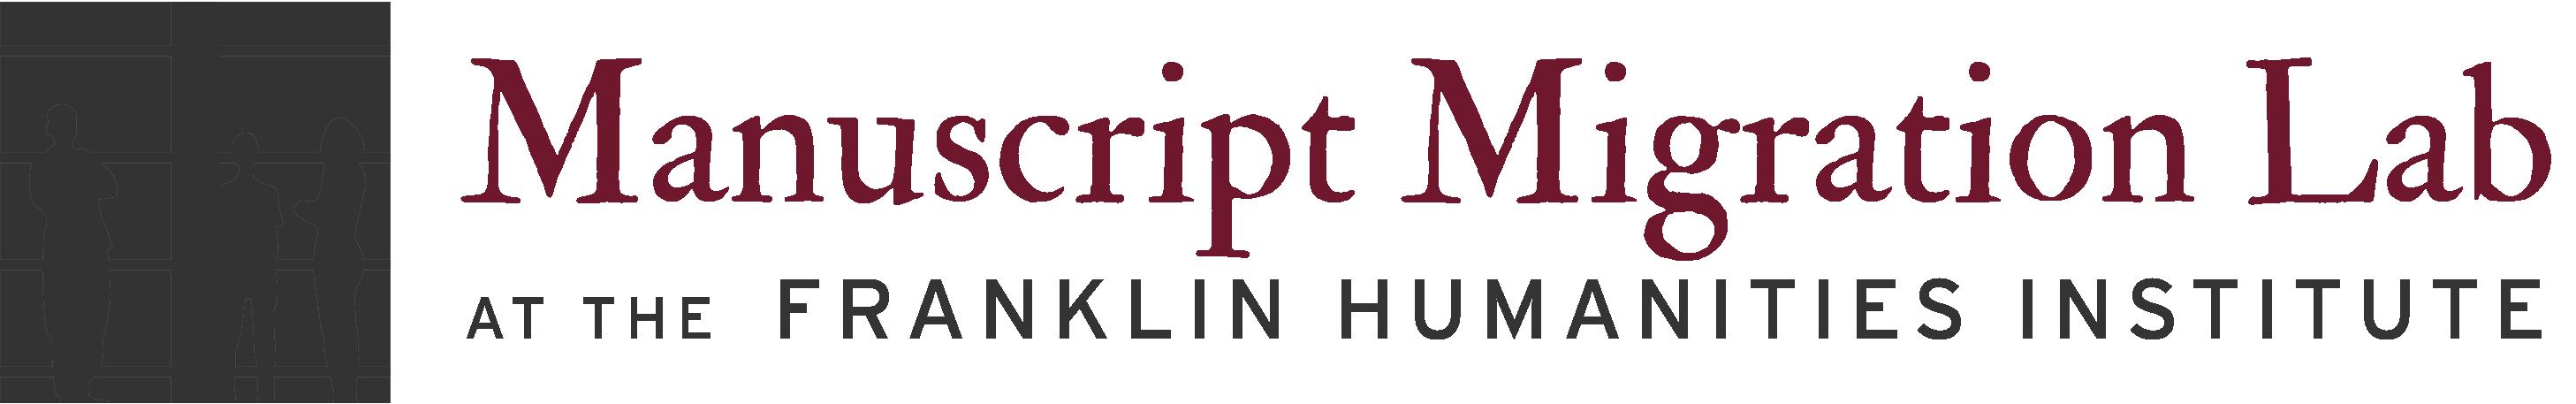 Manuscript Migration Lab